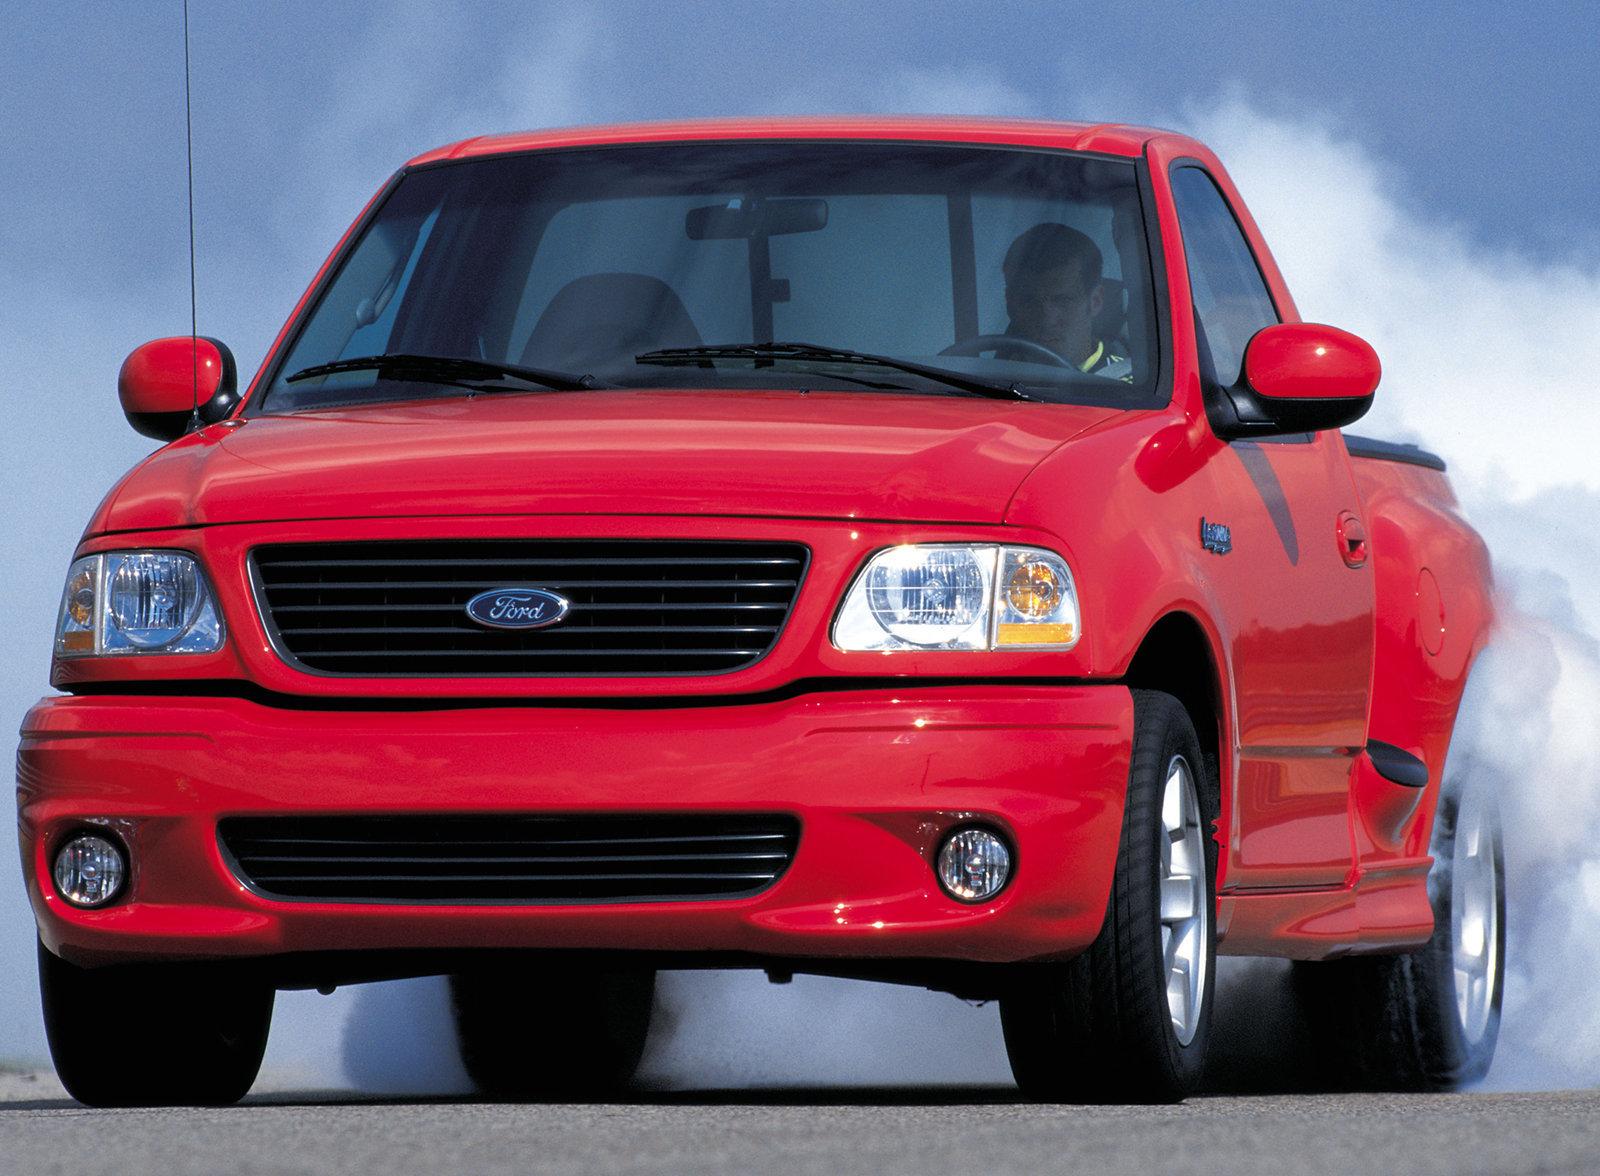 2001 Ford F150 SVT Lightning burnout